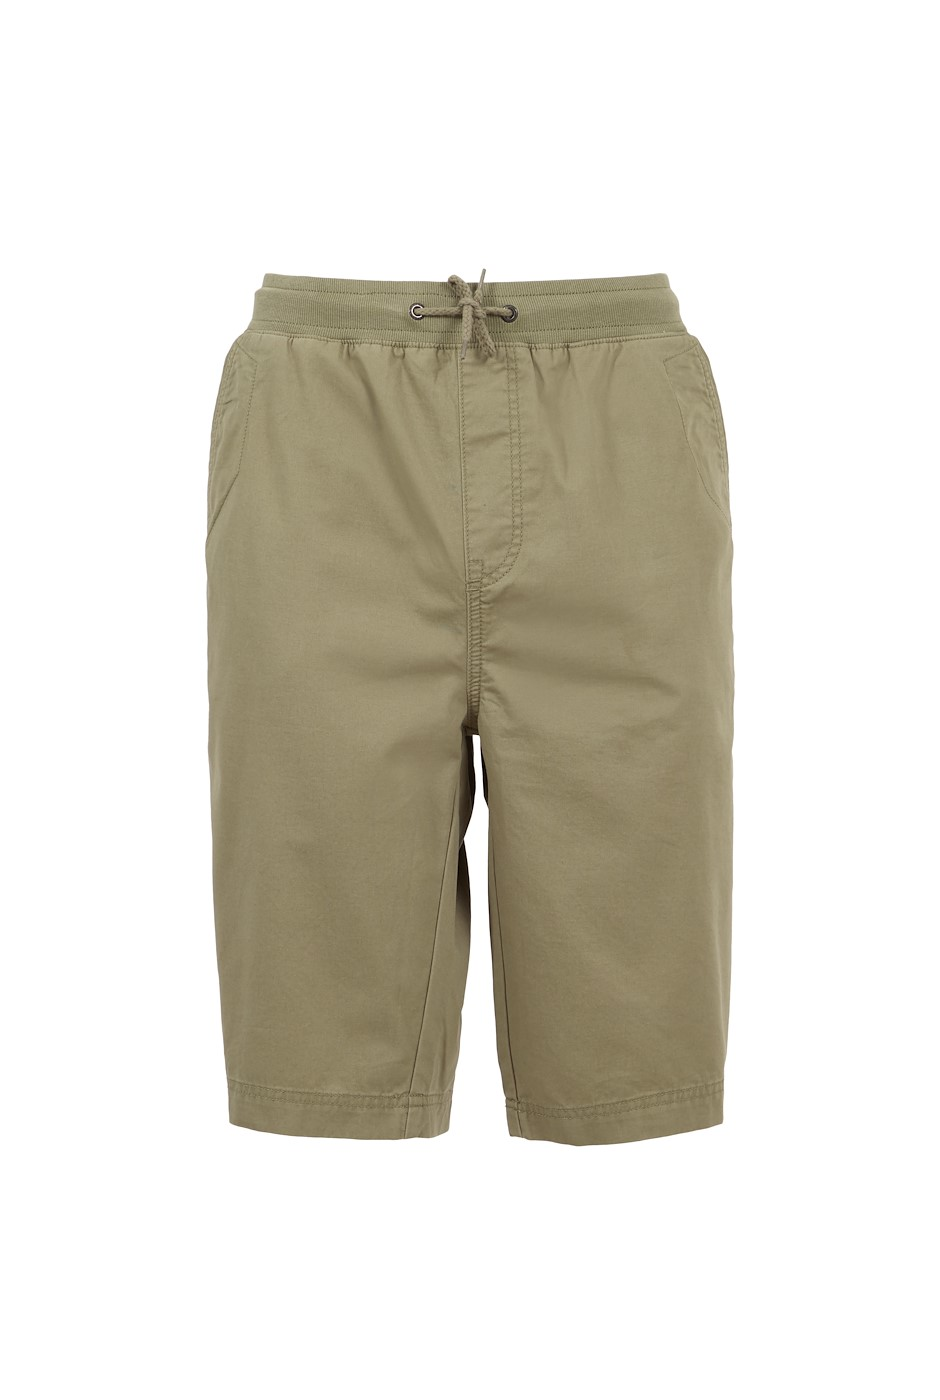 Murrisk Relaxed Casual Shorts Khaki Grey